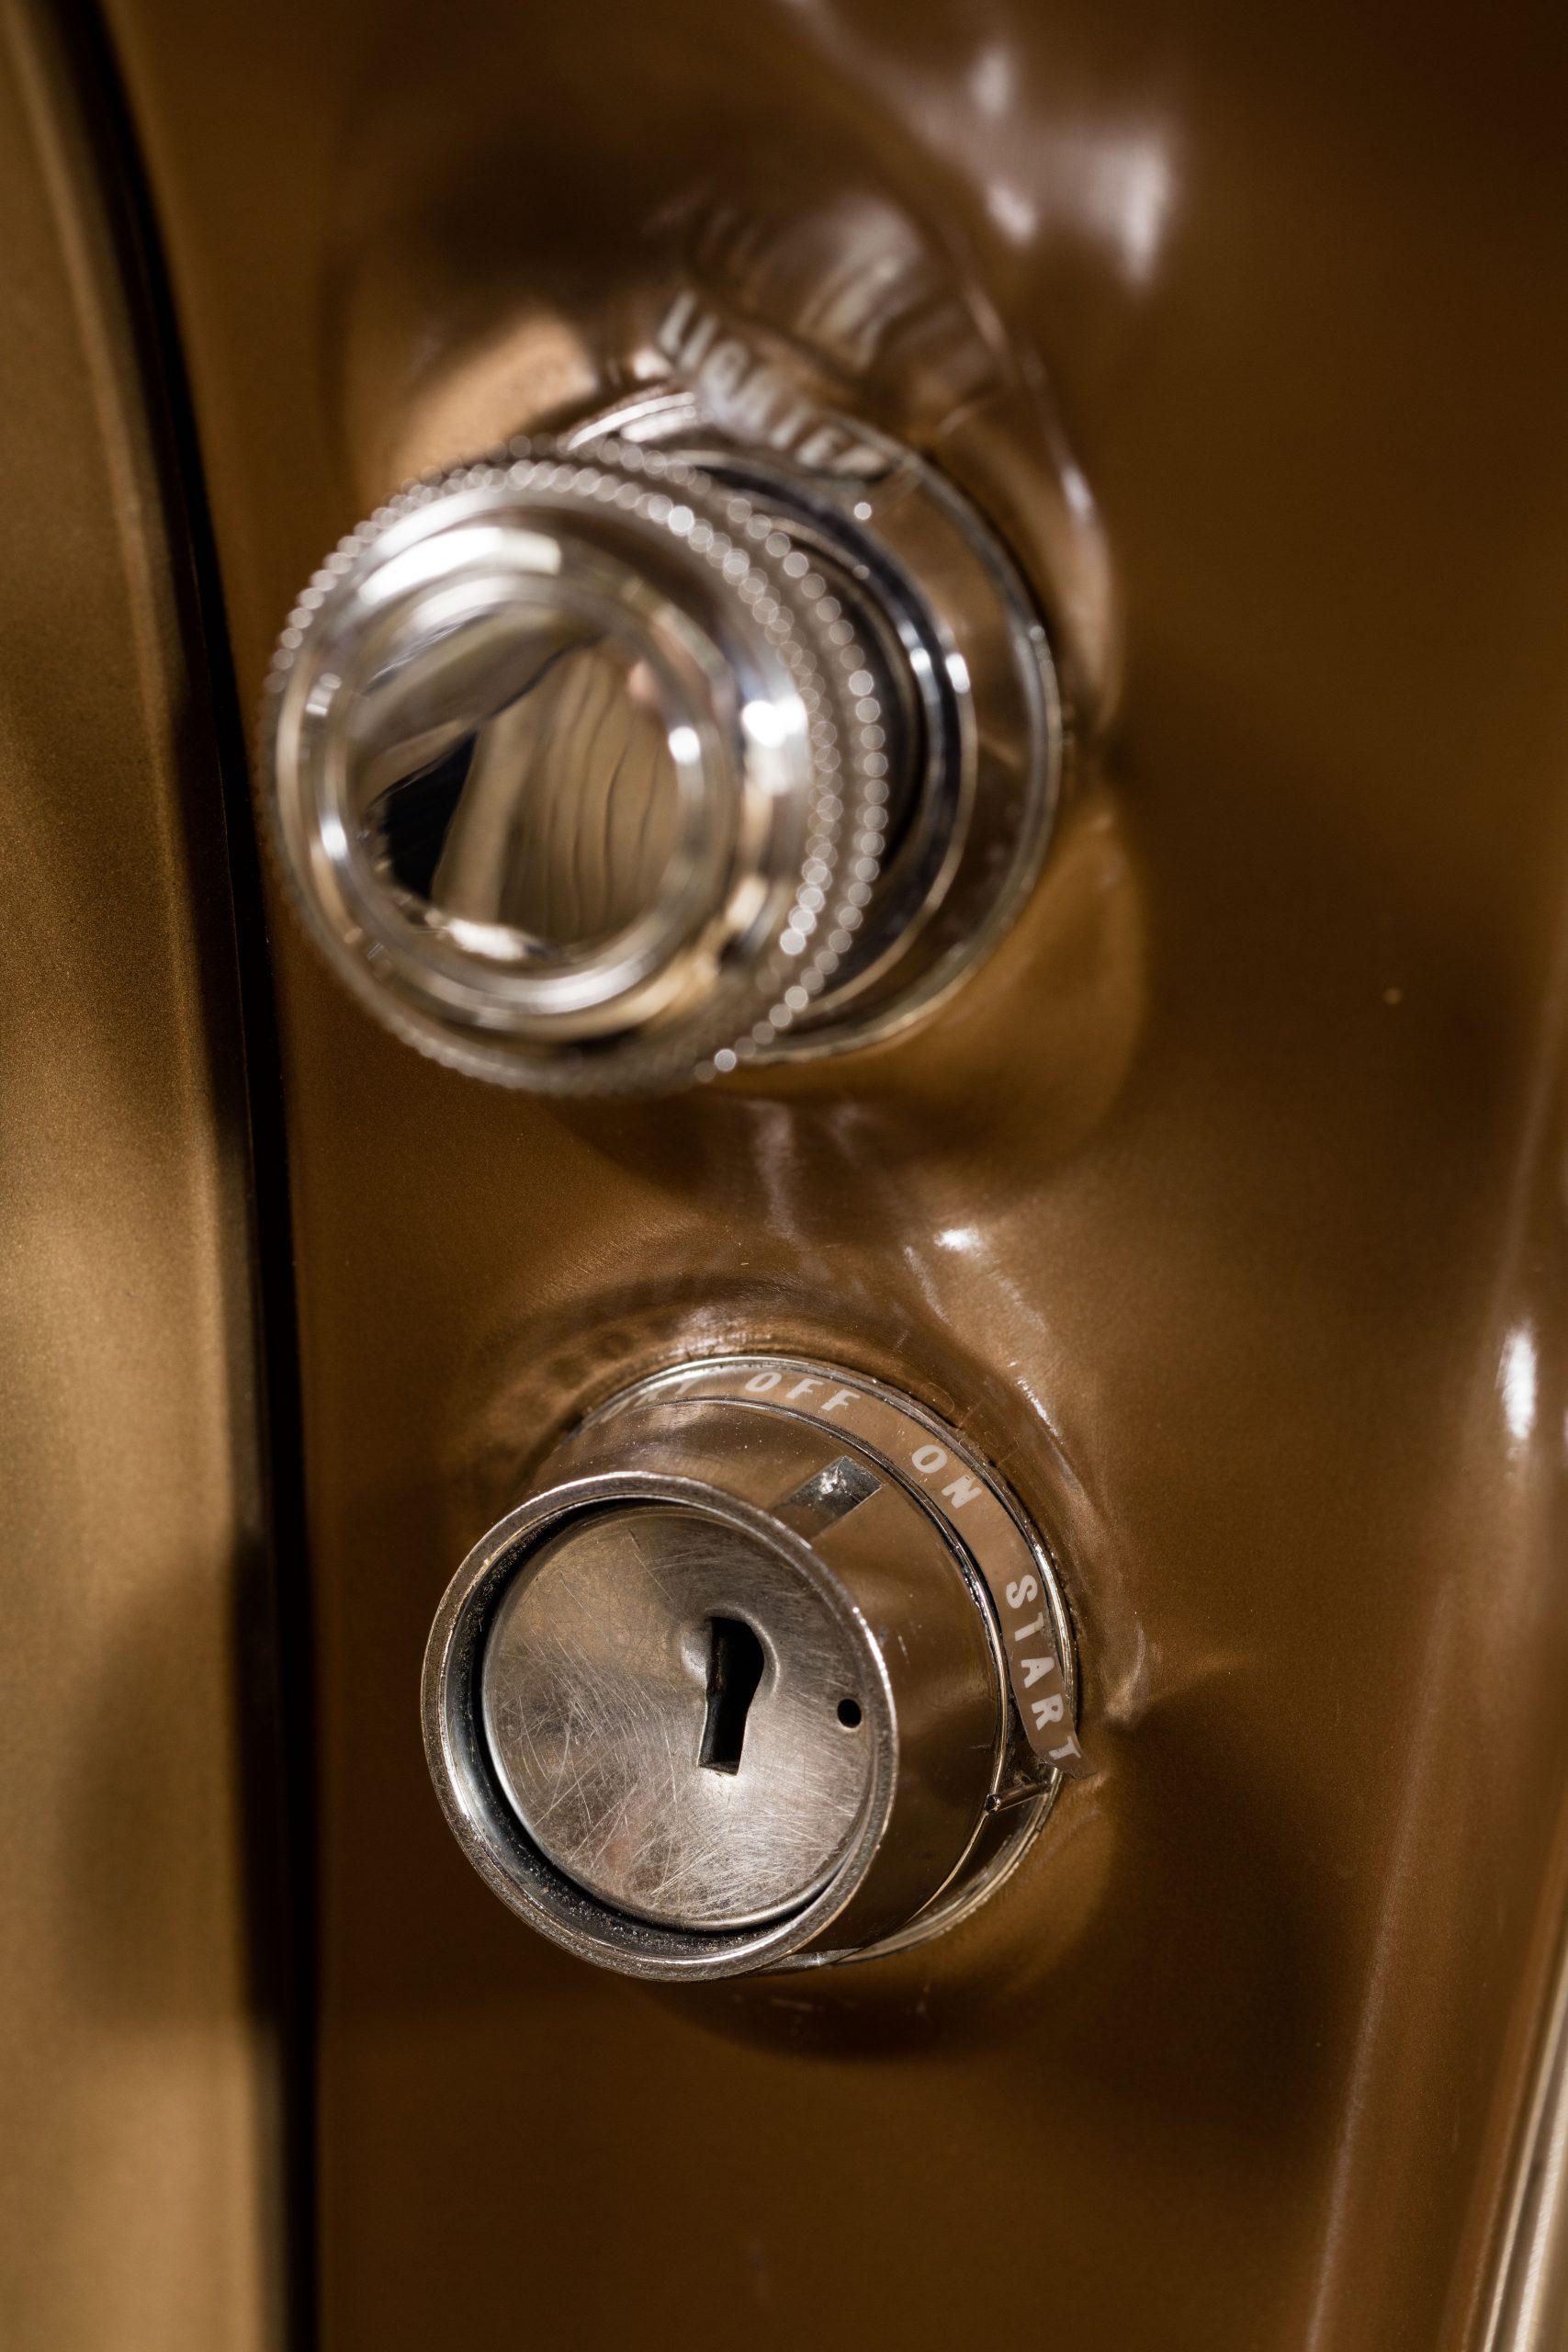 HVA - Chevrolet Camaro N100001 - Closeup ignition